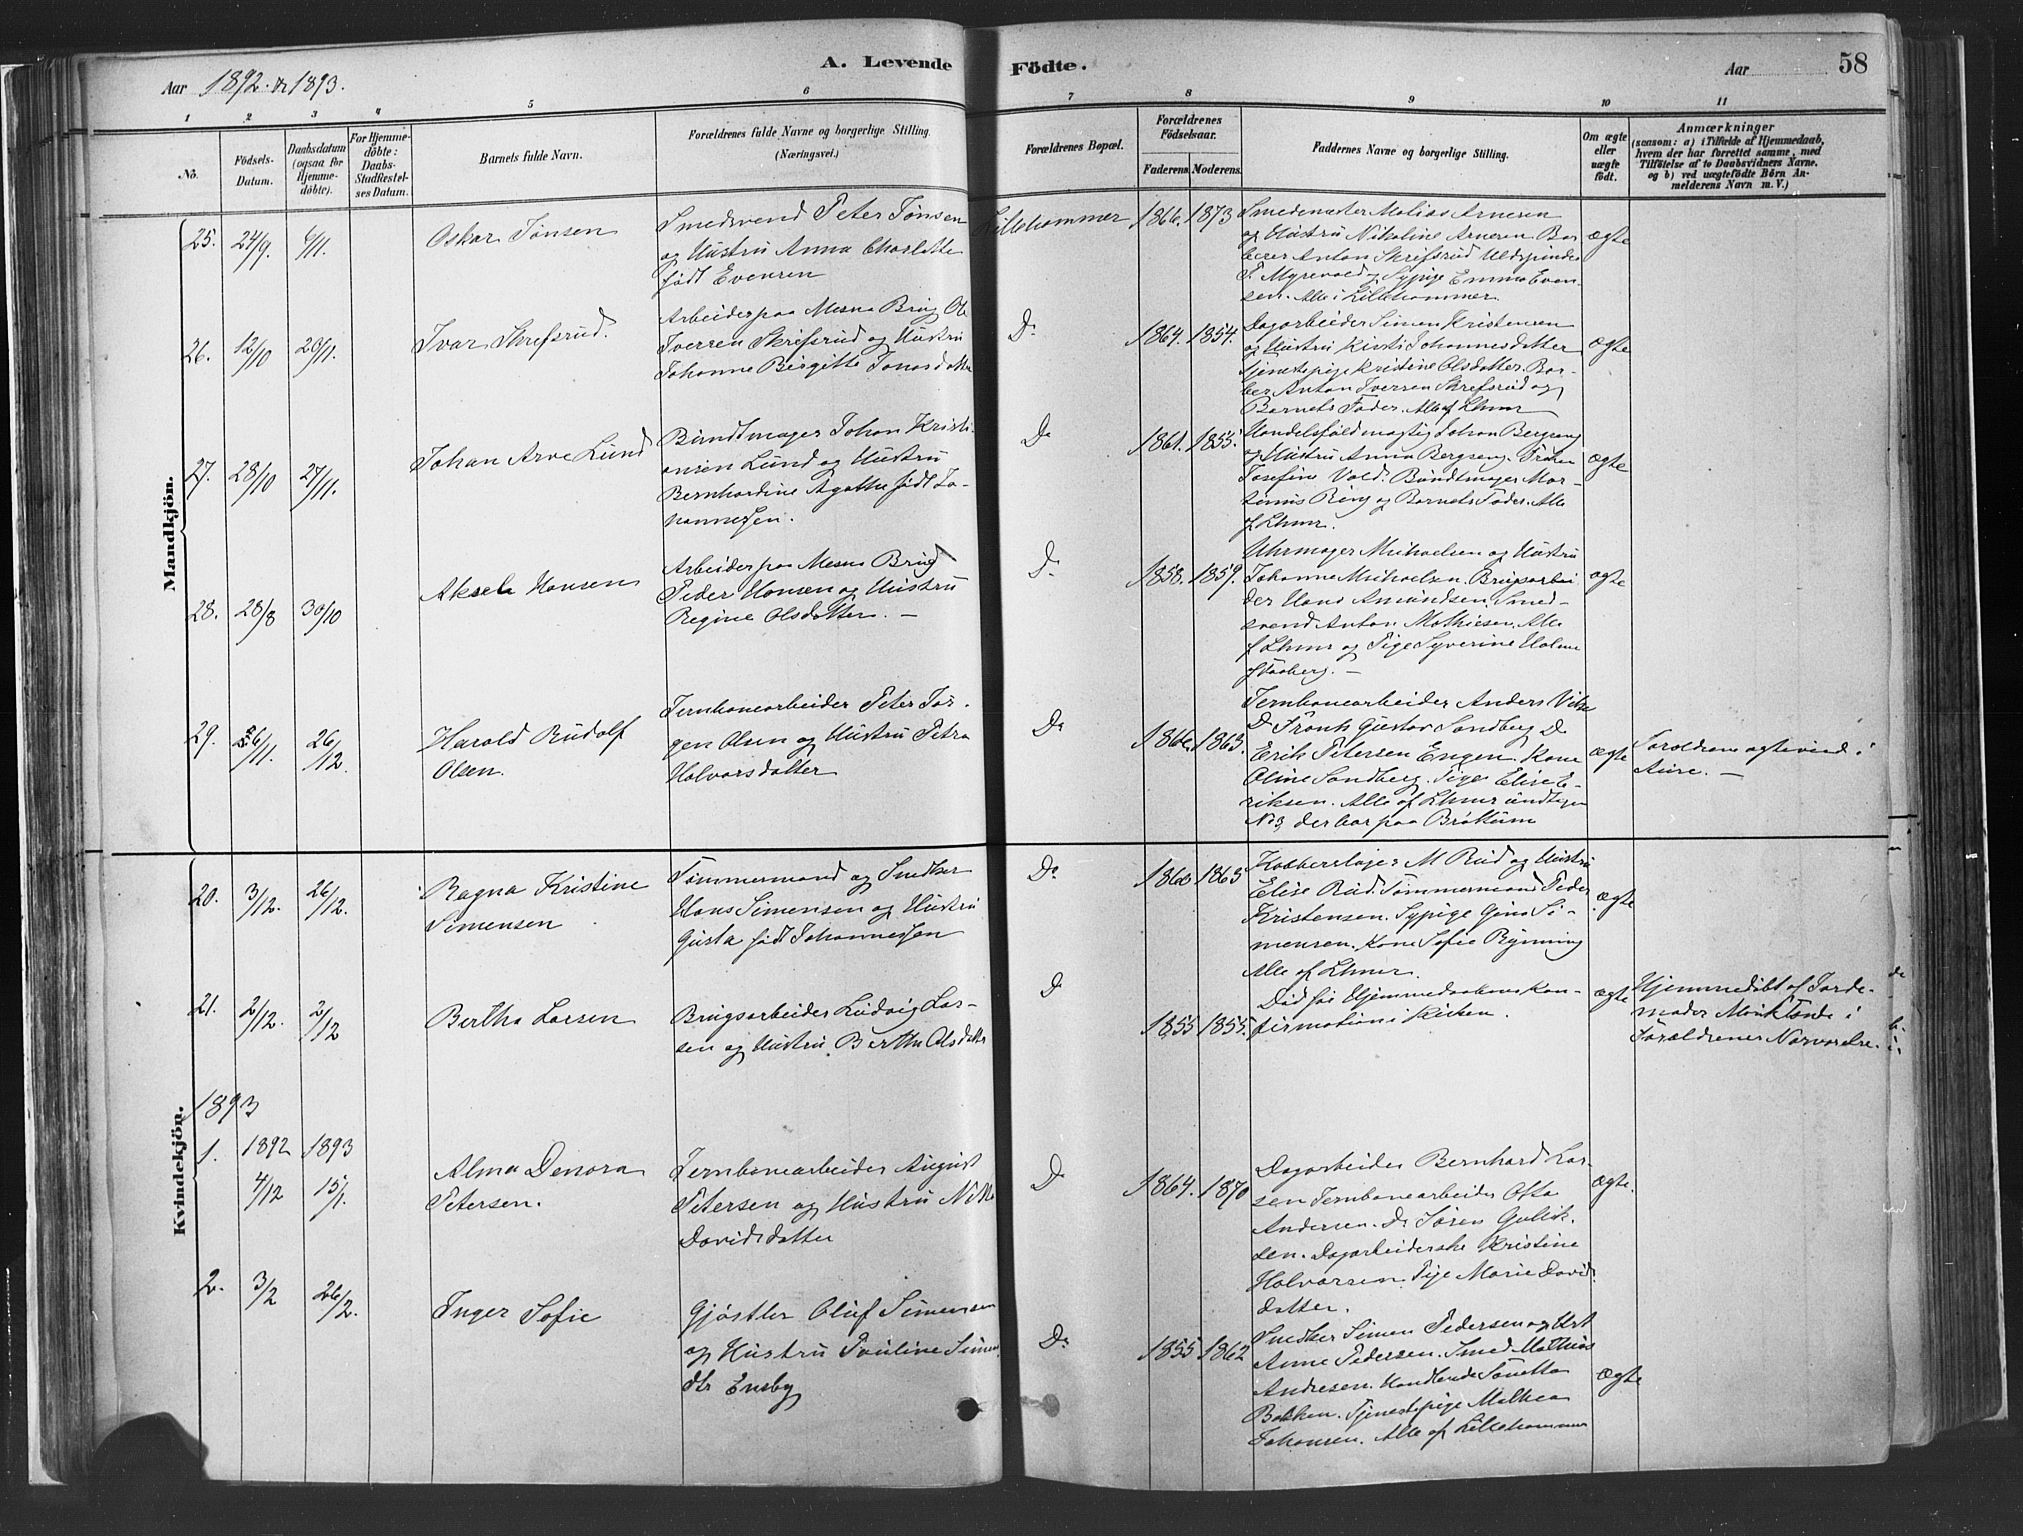 SAH, Fåberg prestekontor, H/Ha/Haa/L0010: Ministerialbok nr. 10, 1879-1900, s. 58